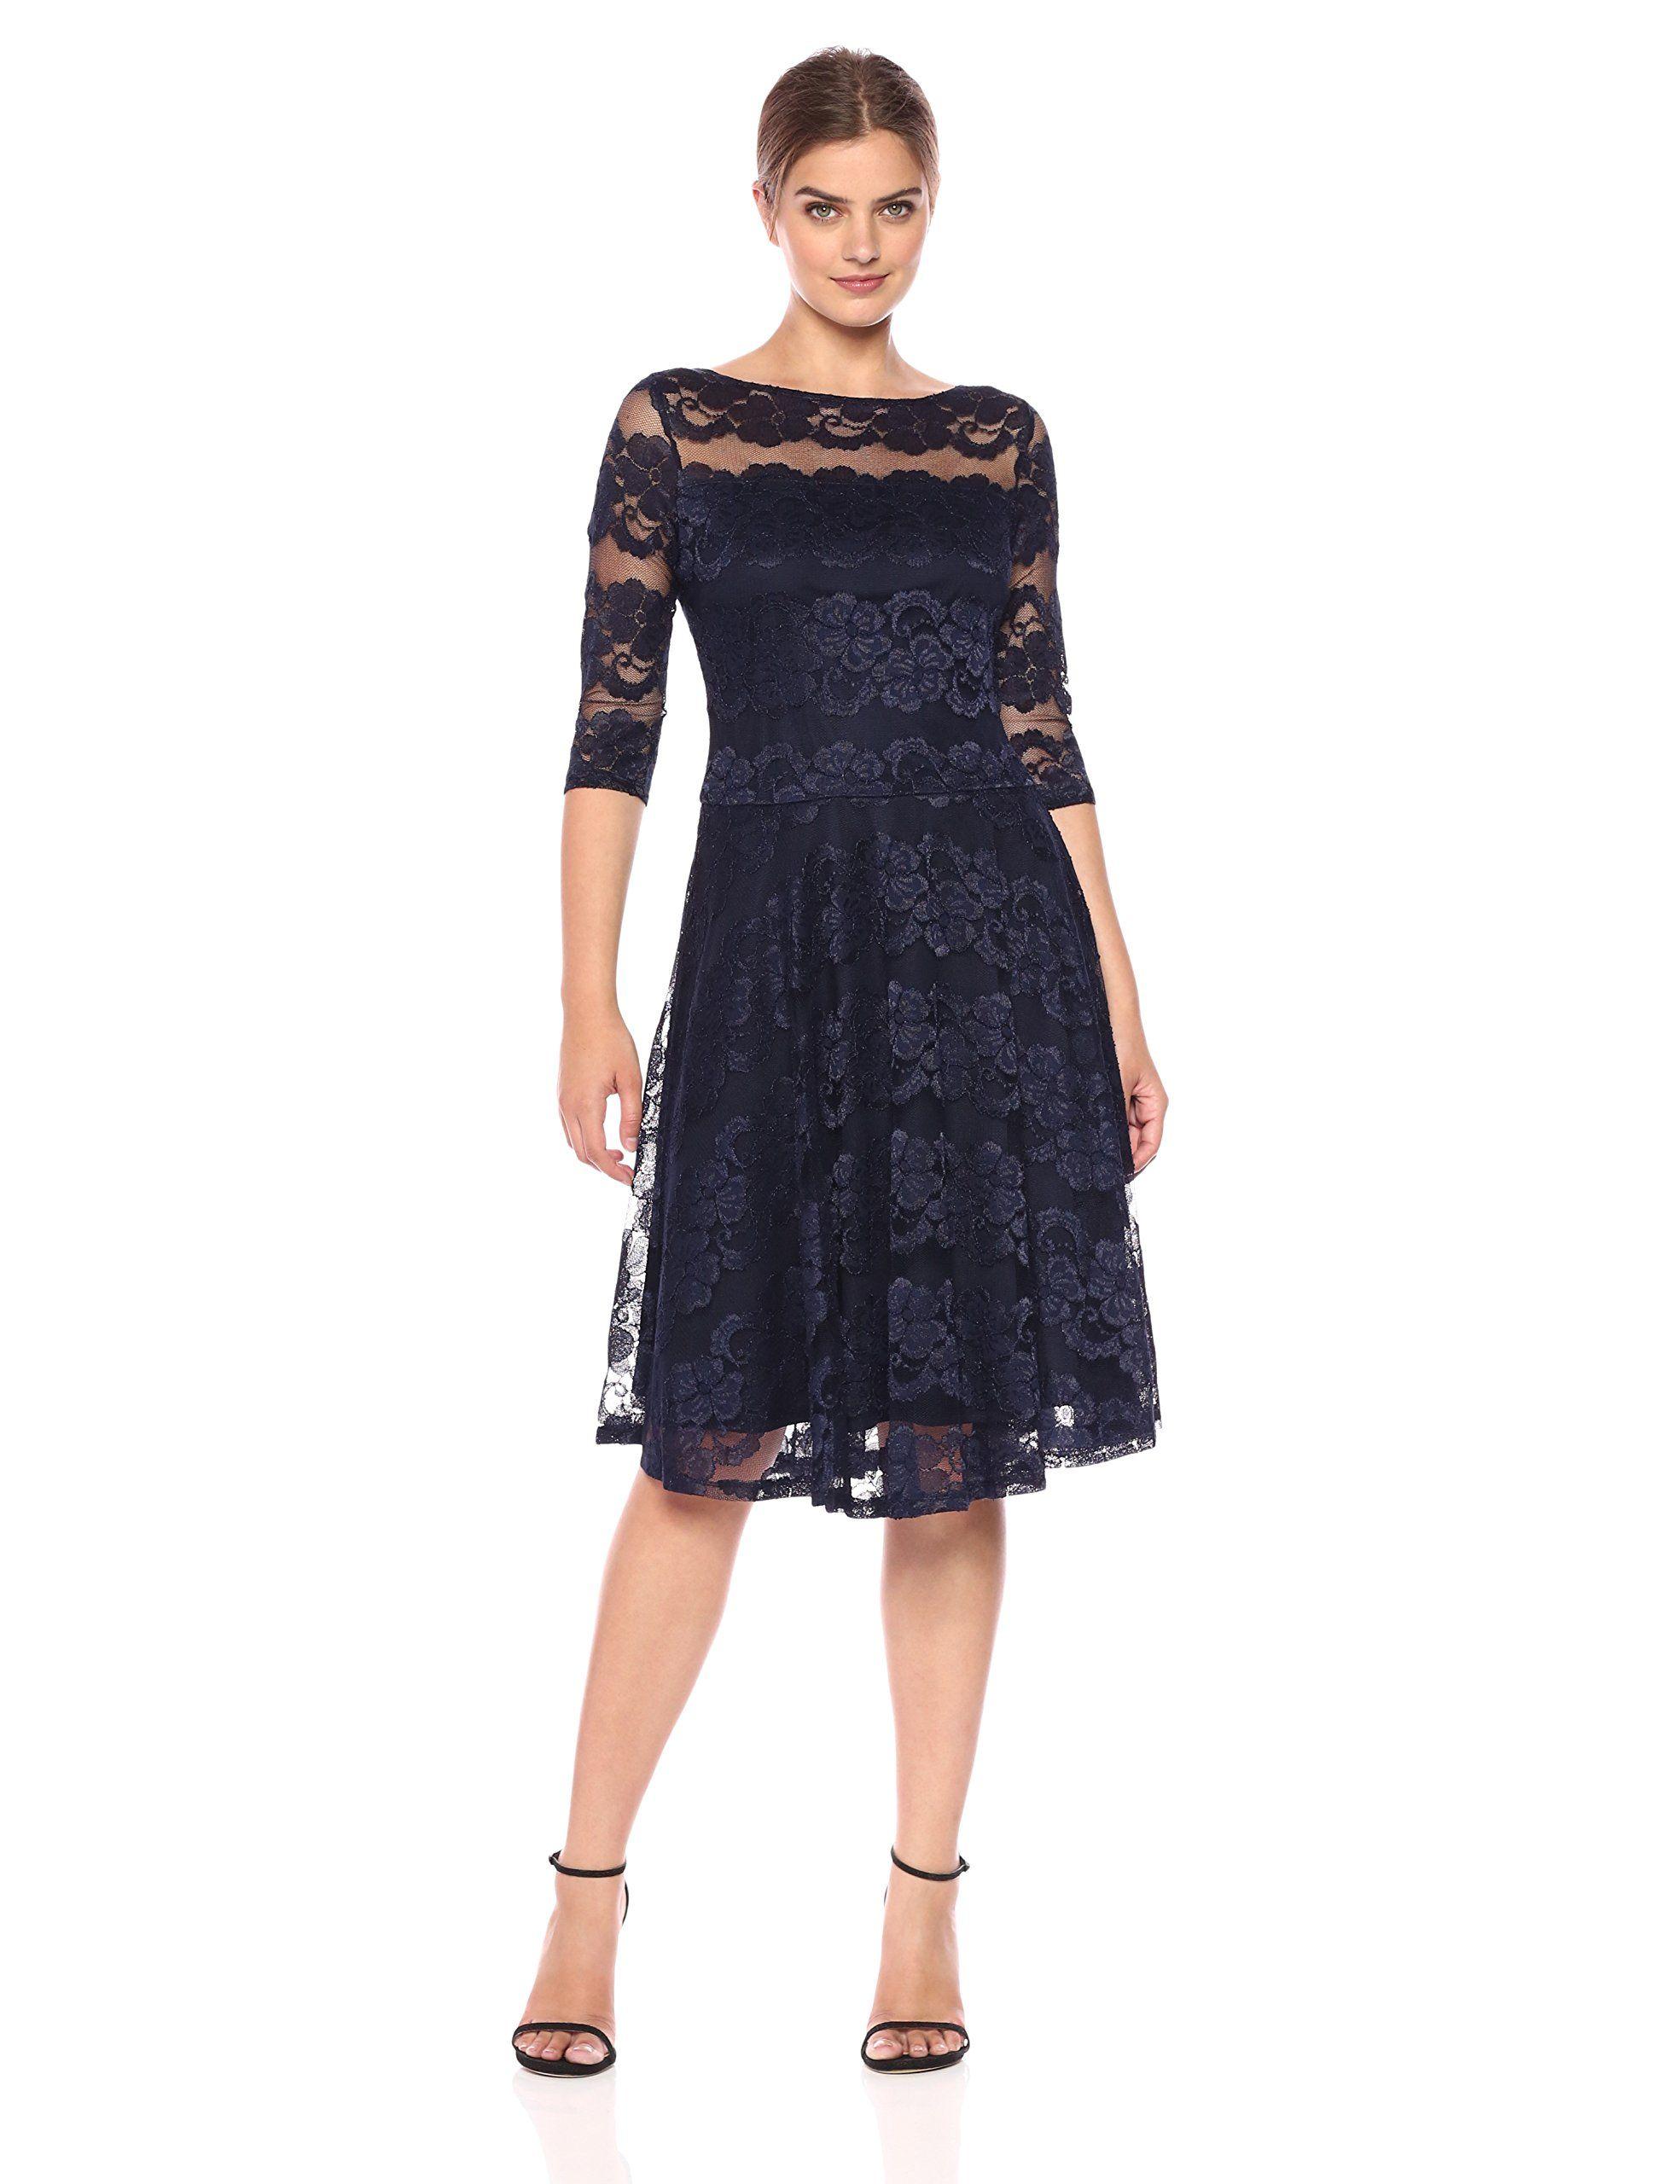 39d5873973c AMAZON Sangria Women s 3 4 Sleeve Sequin Lace Party Dress PRODUCT PAGE    https